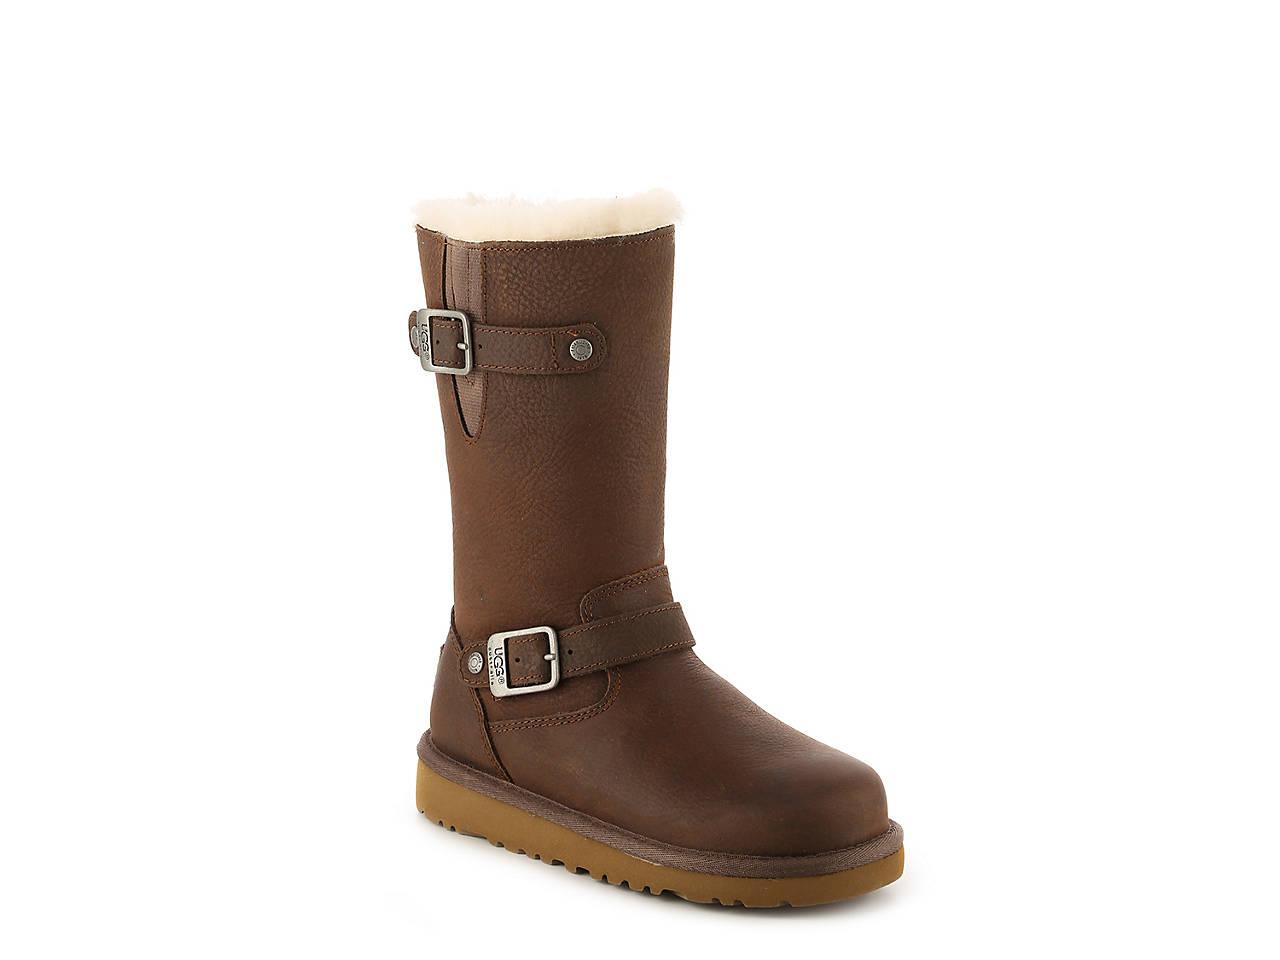 Ugg Kensington Boots